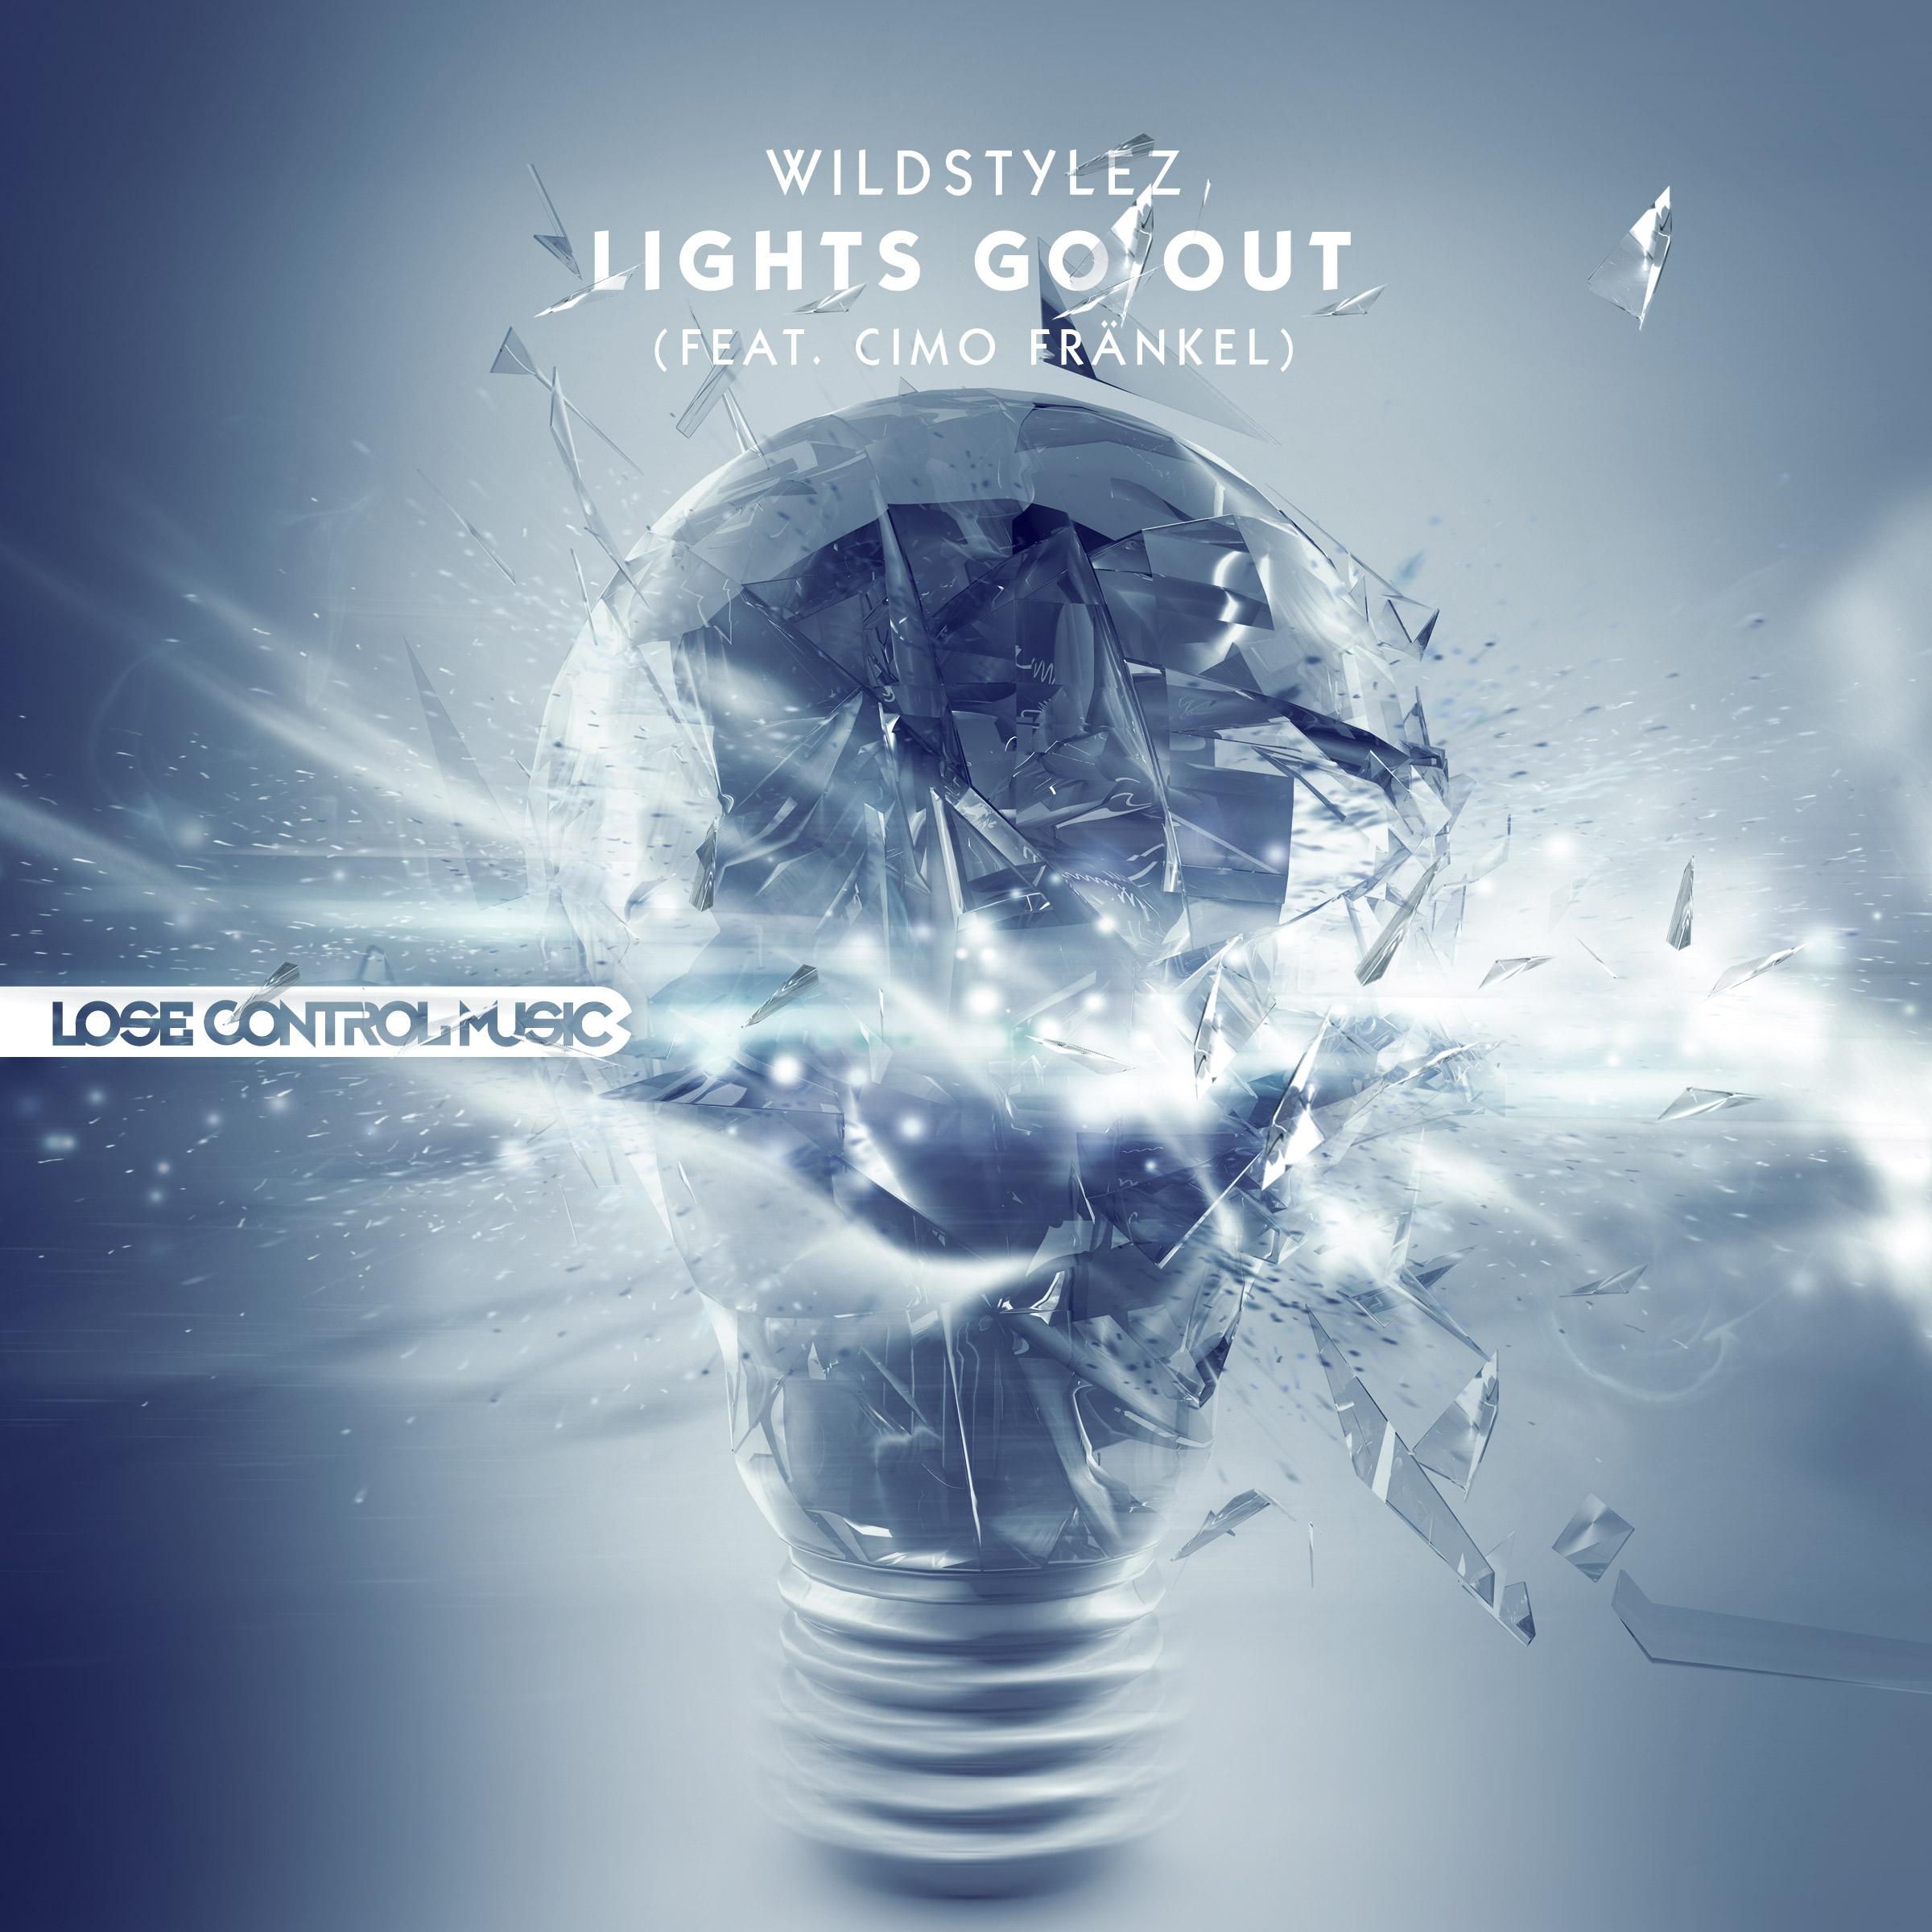 Wildstylez - Lights Go Out feat. Cimo Fränkel 2400x2400px-372dpi